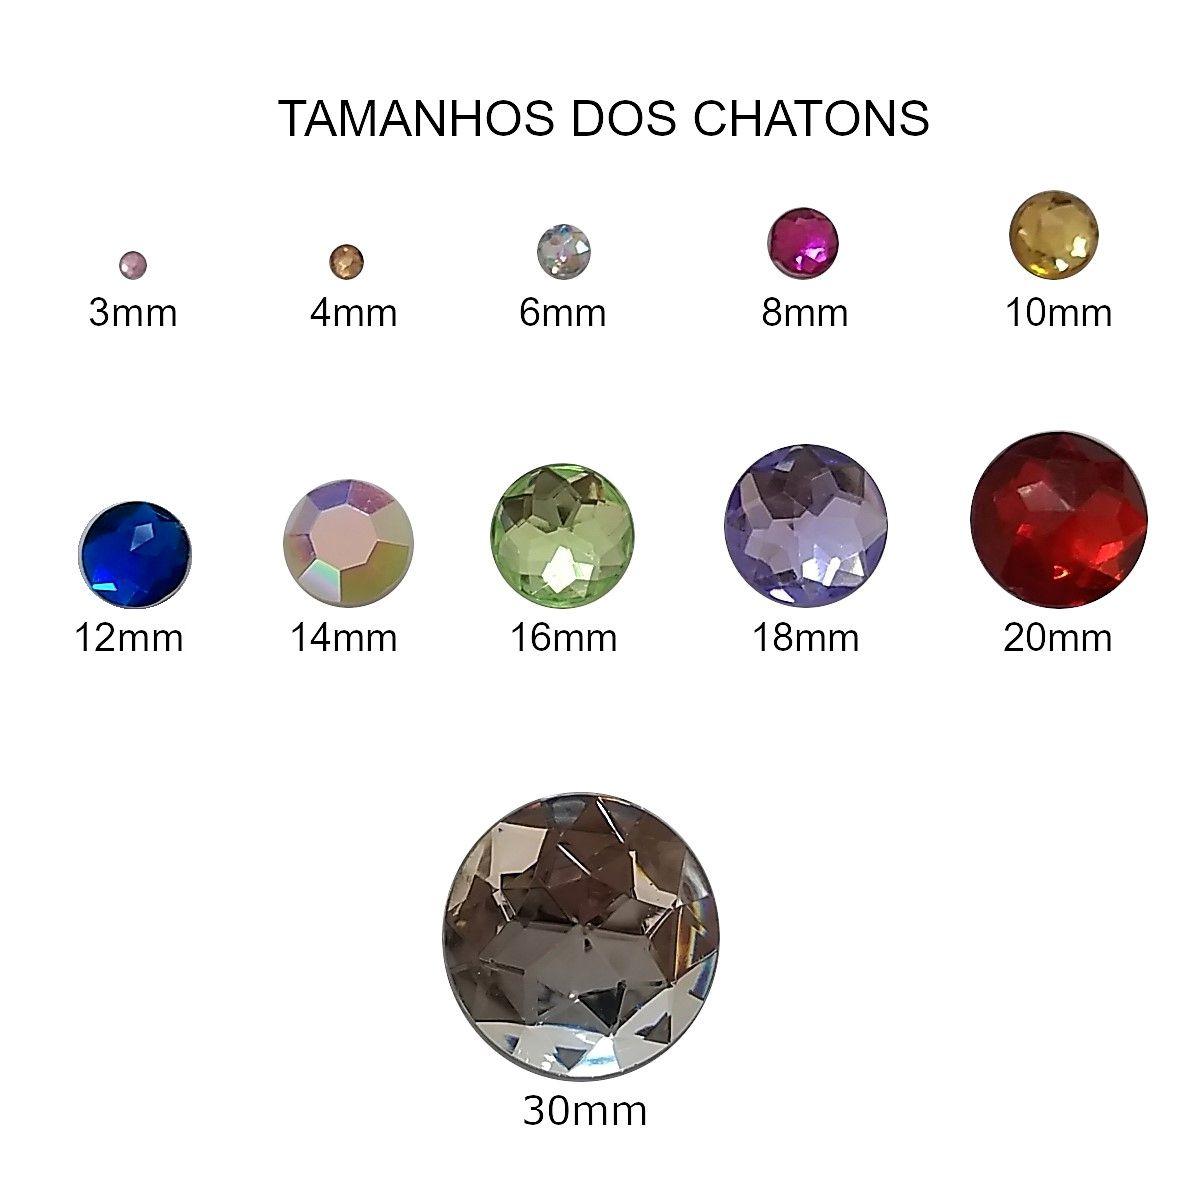 Chaton Costura Redondo Verde Claro 6mm a 16mm  - SanBiju